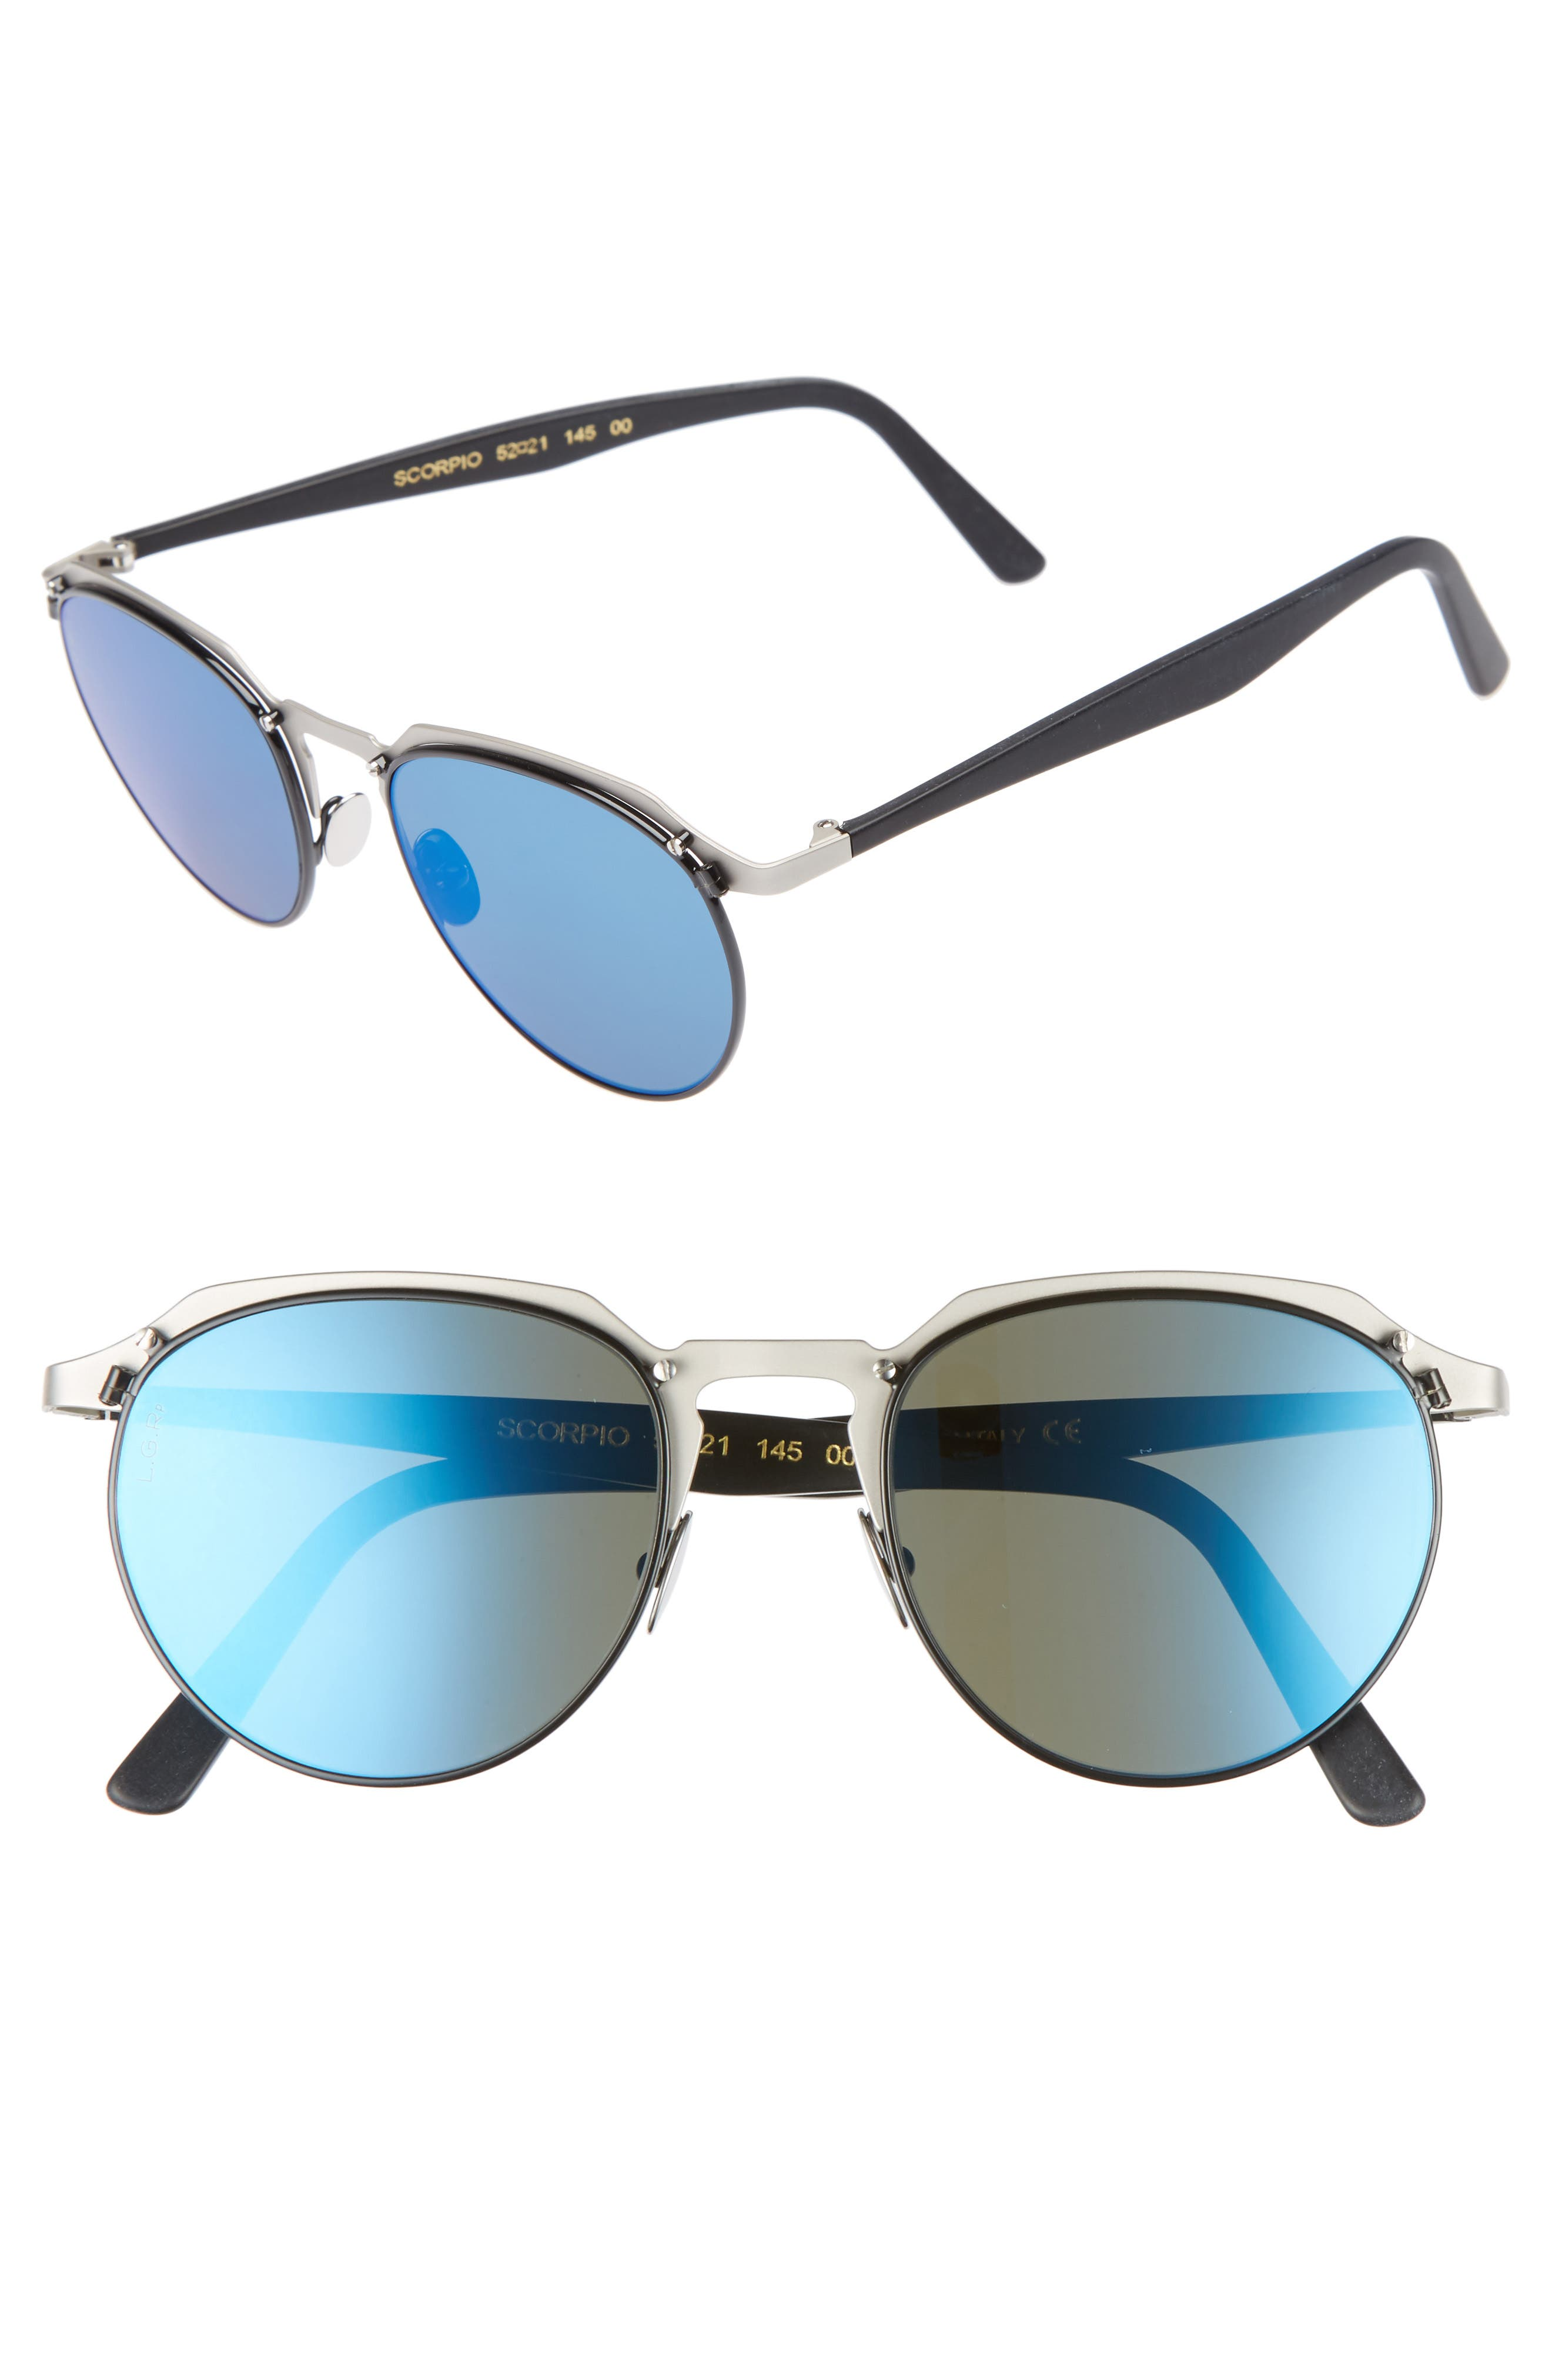 Scorpio 52mm Polarized Sunglasses,                             Main thumbnail 1, color,                             020